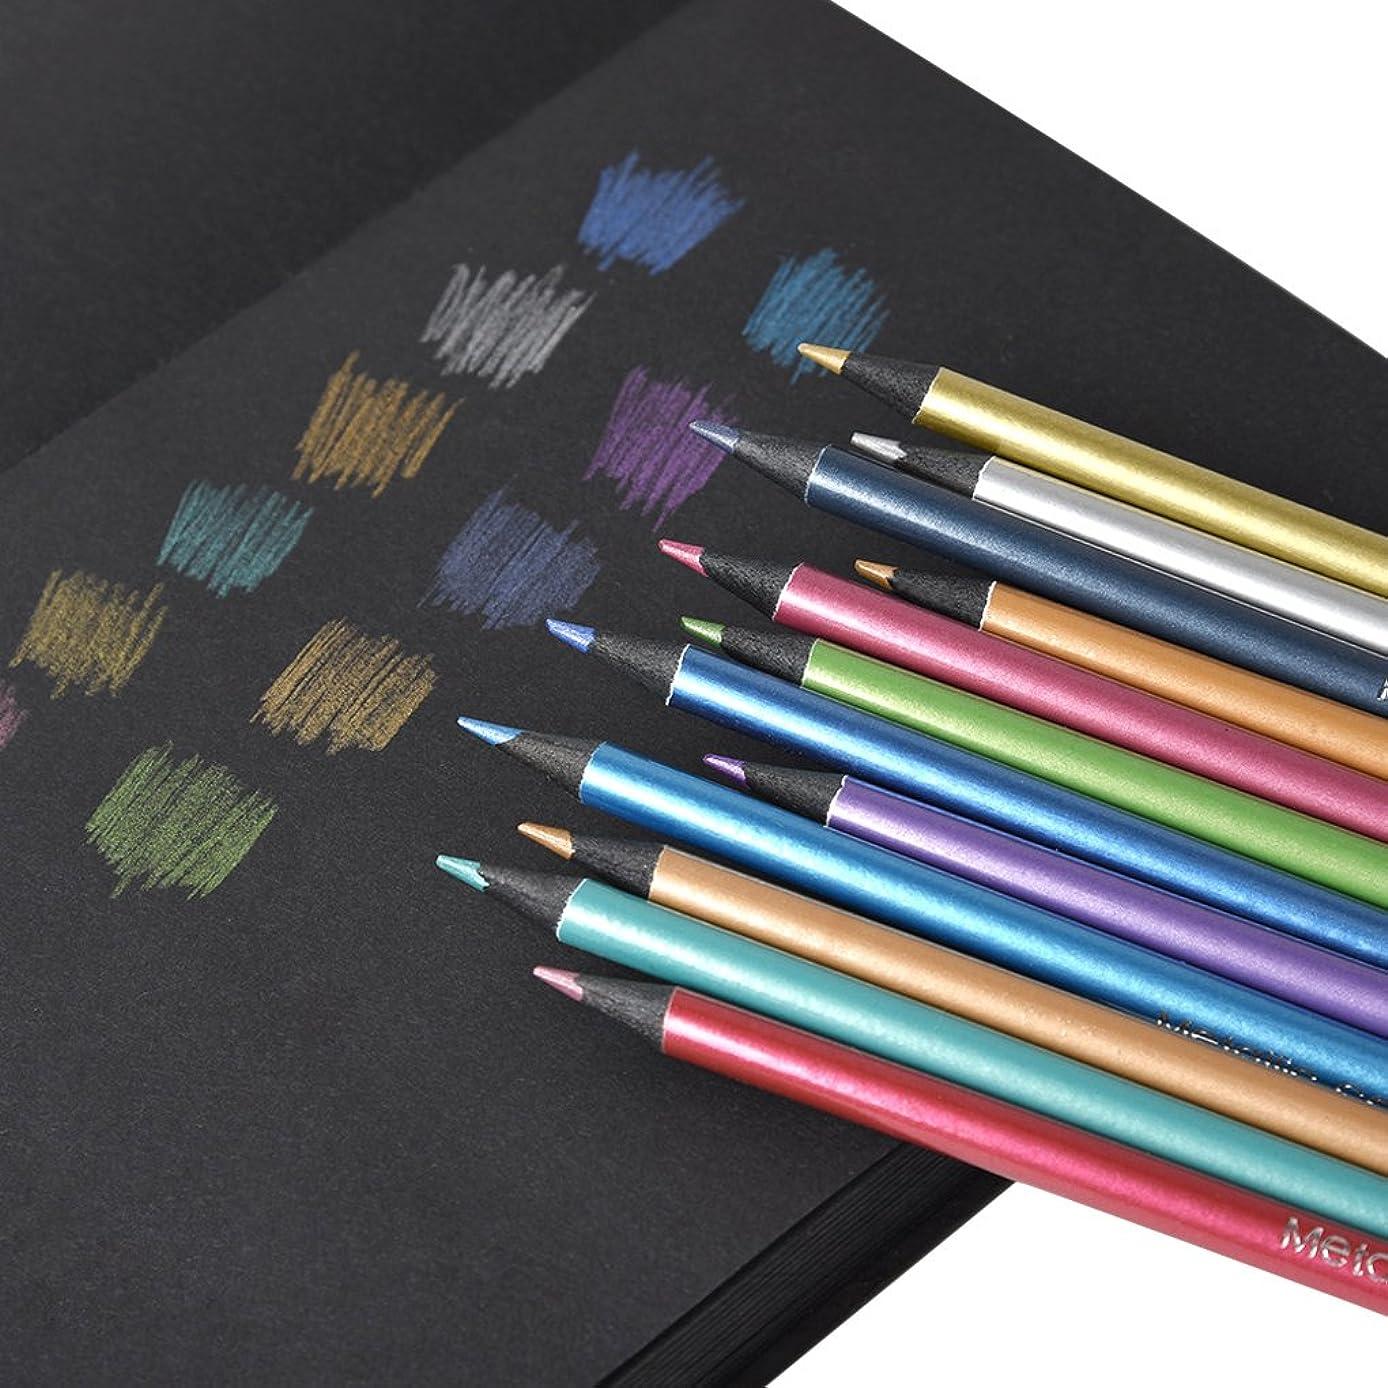 12 Count Metallic Colored Pencils Non-Toxic Black Wood Drawing Pencils?Break Resistant Coloring Pencils Art Supplies?Painting Pen?for Adults Kids?Students Sketching Coloring Book Art Craft Graffiti